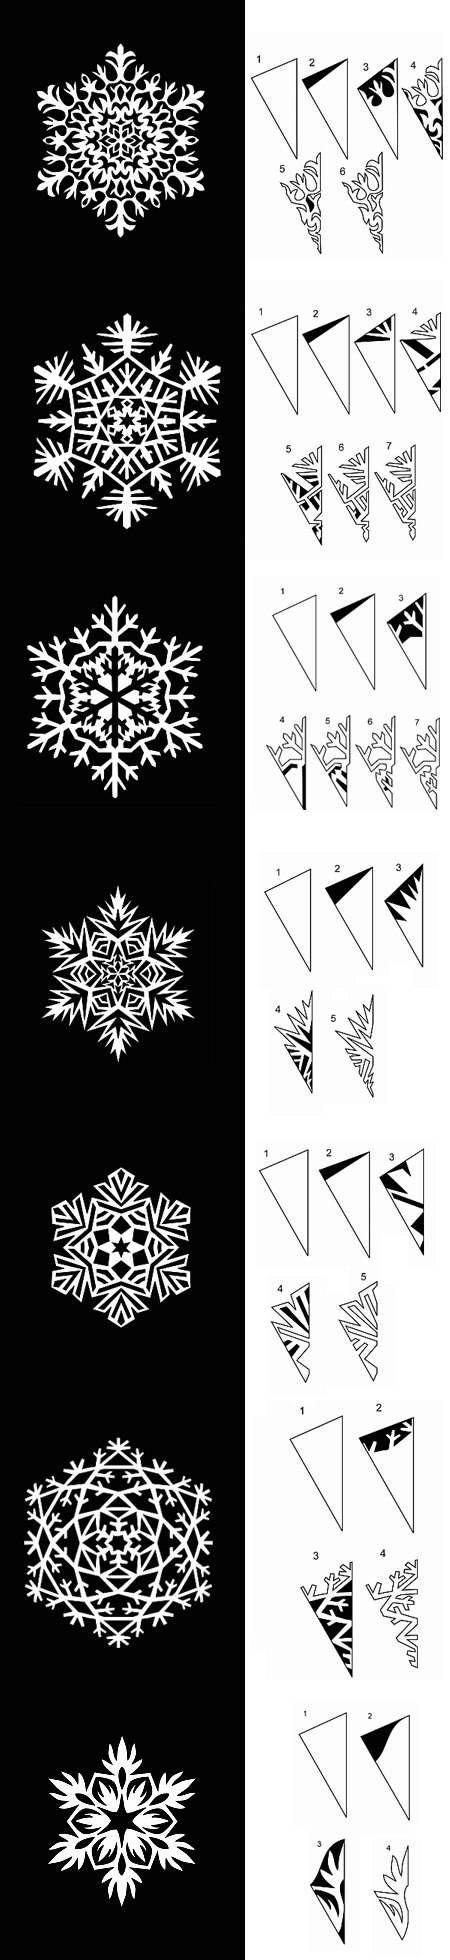 DIY Paper Snowflakes Templates DIY Projects | UsefulDIY.com Follow Us on Facebook --> https://www.facebook.com/UsefulDiy